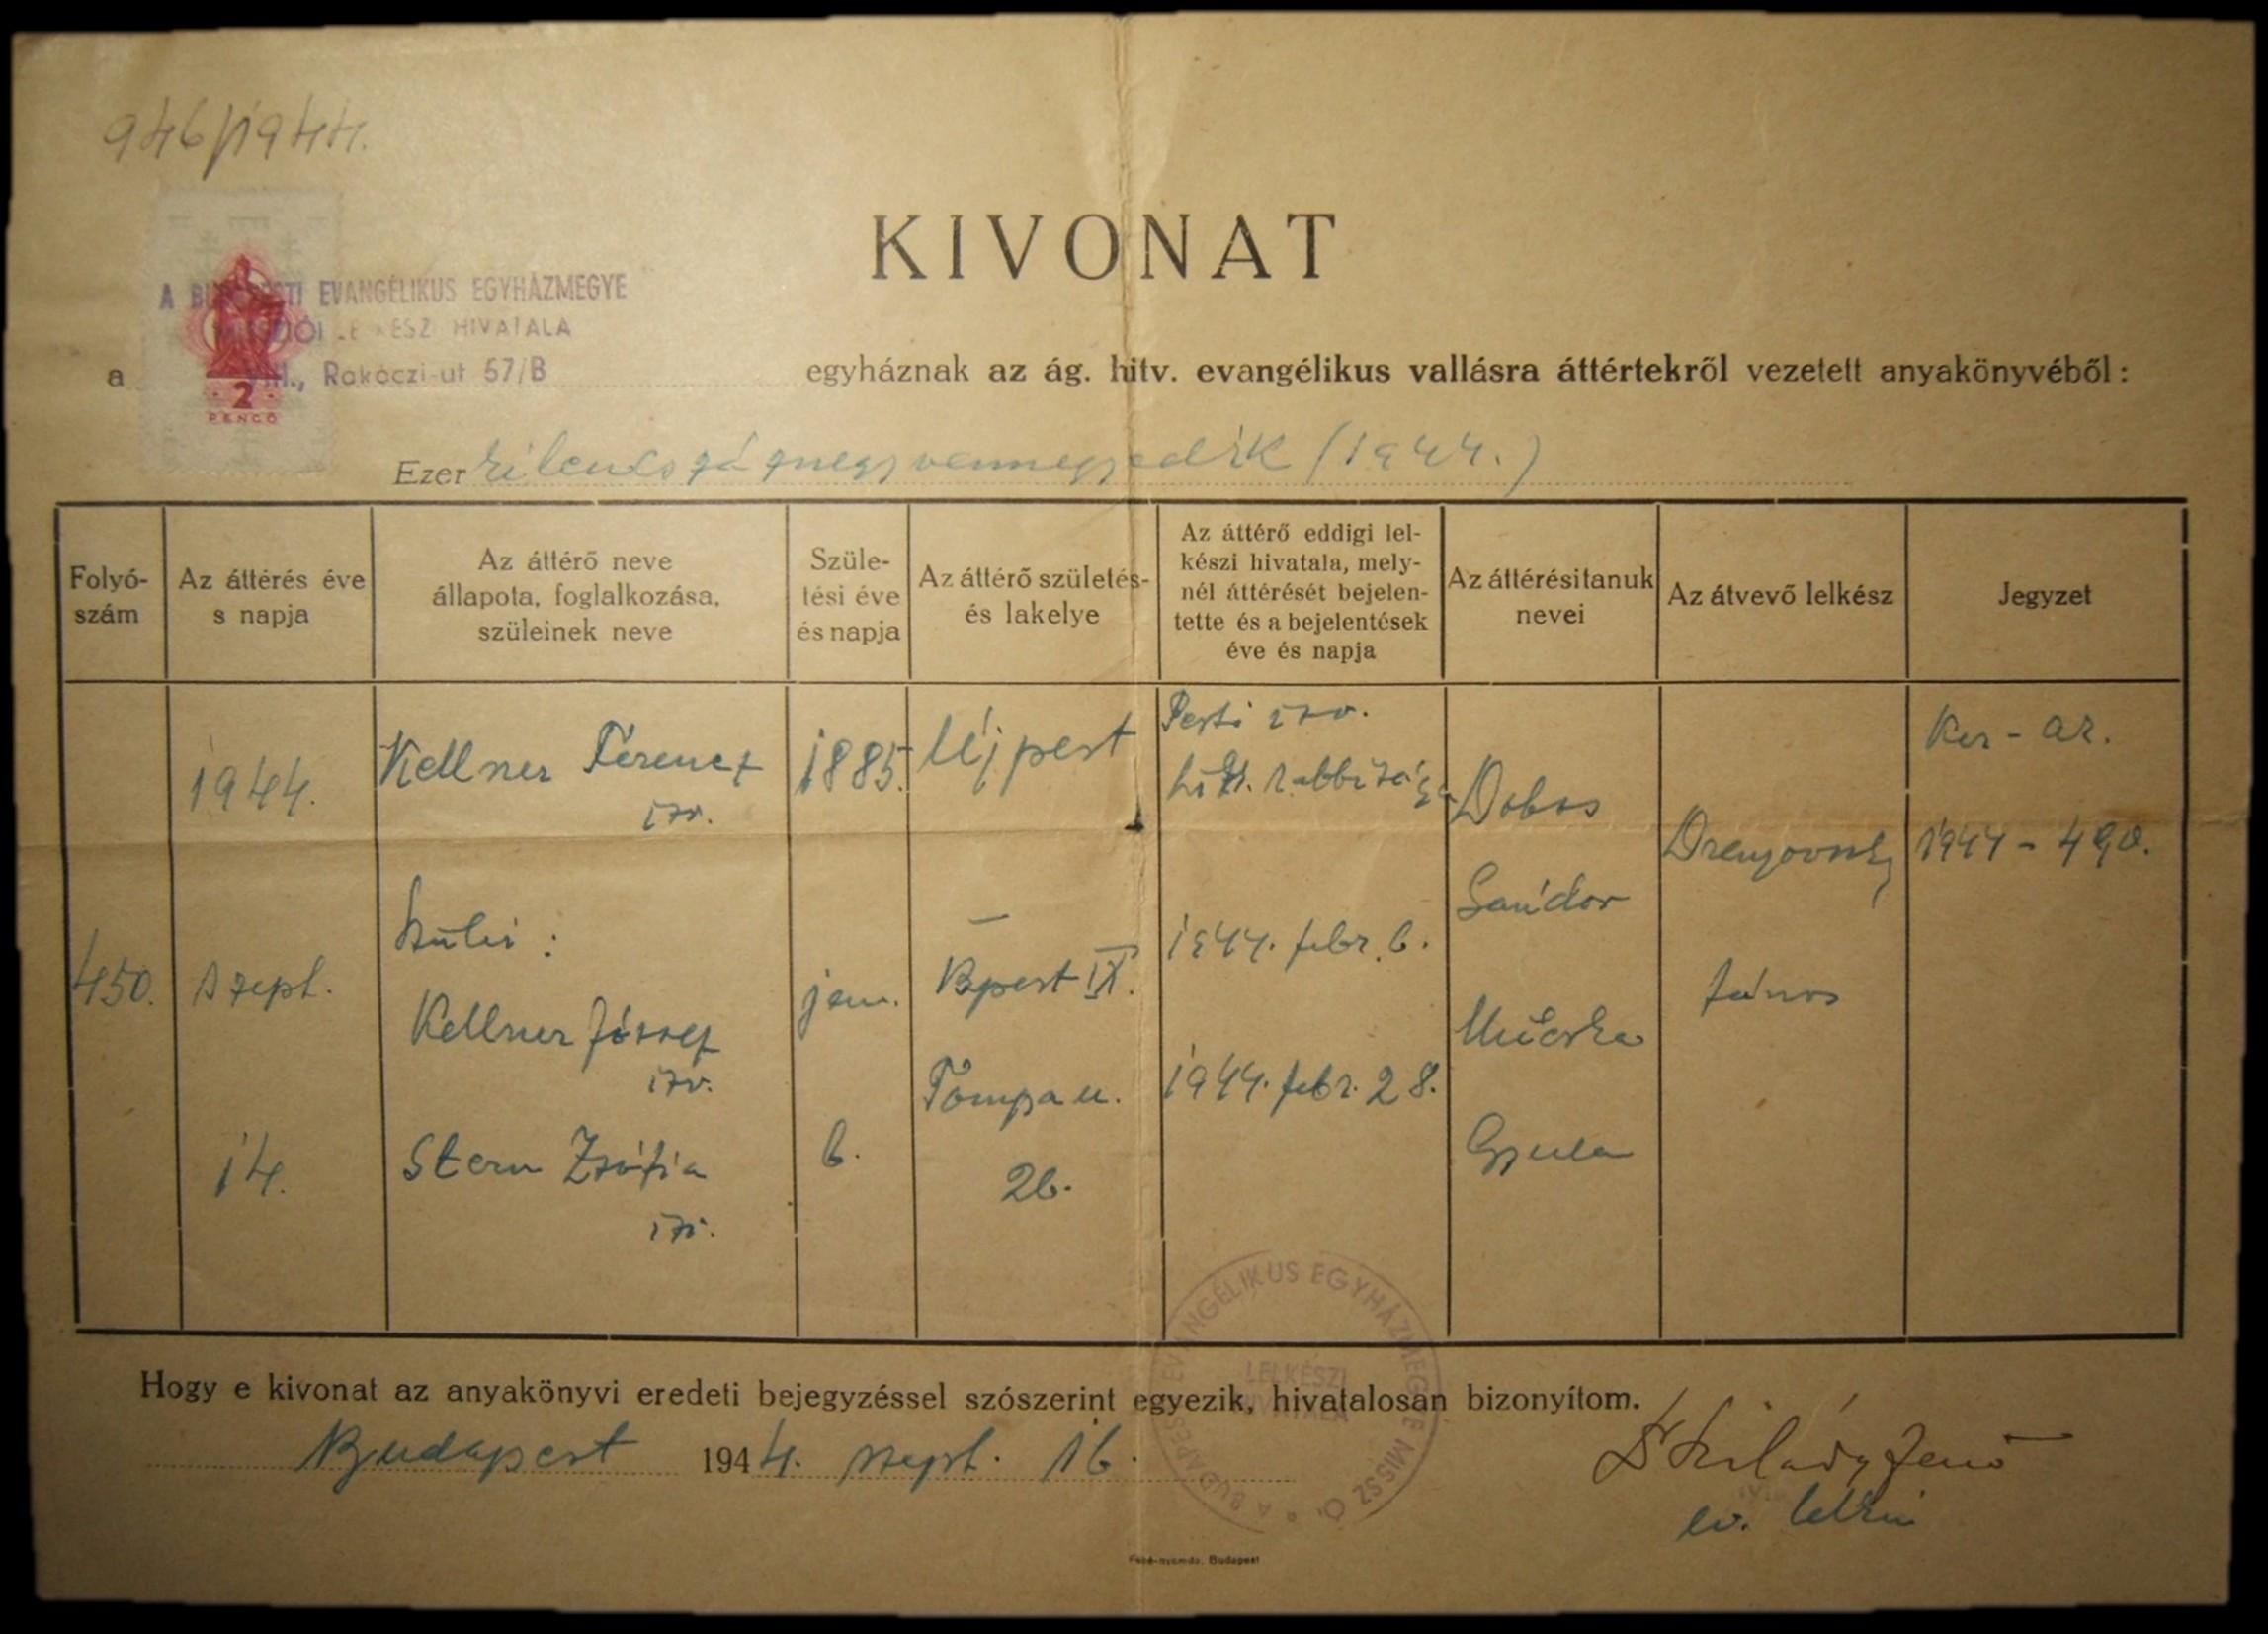 Holocaust-era Hungarian conversion document of Budpest Evangelical Church 1944